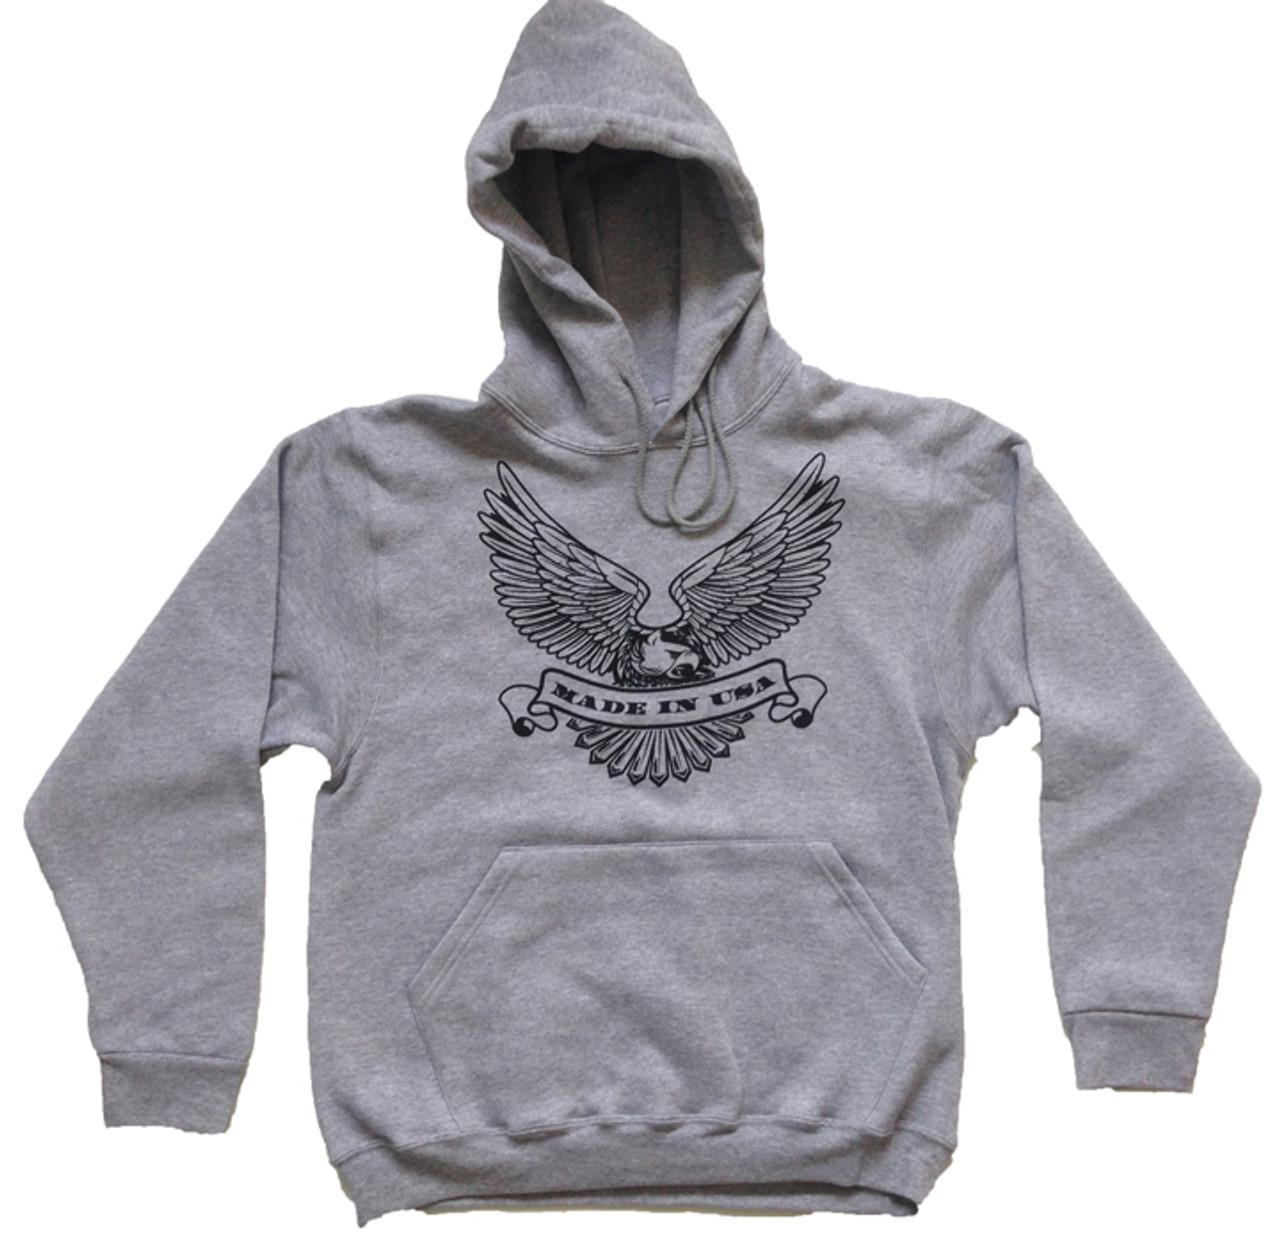 17967817 Made in U.S.A. Eagle Hoodie